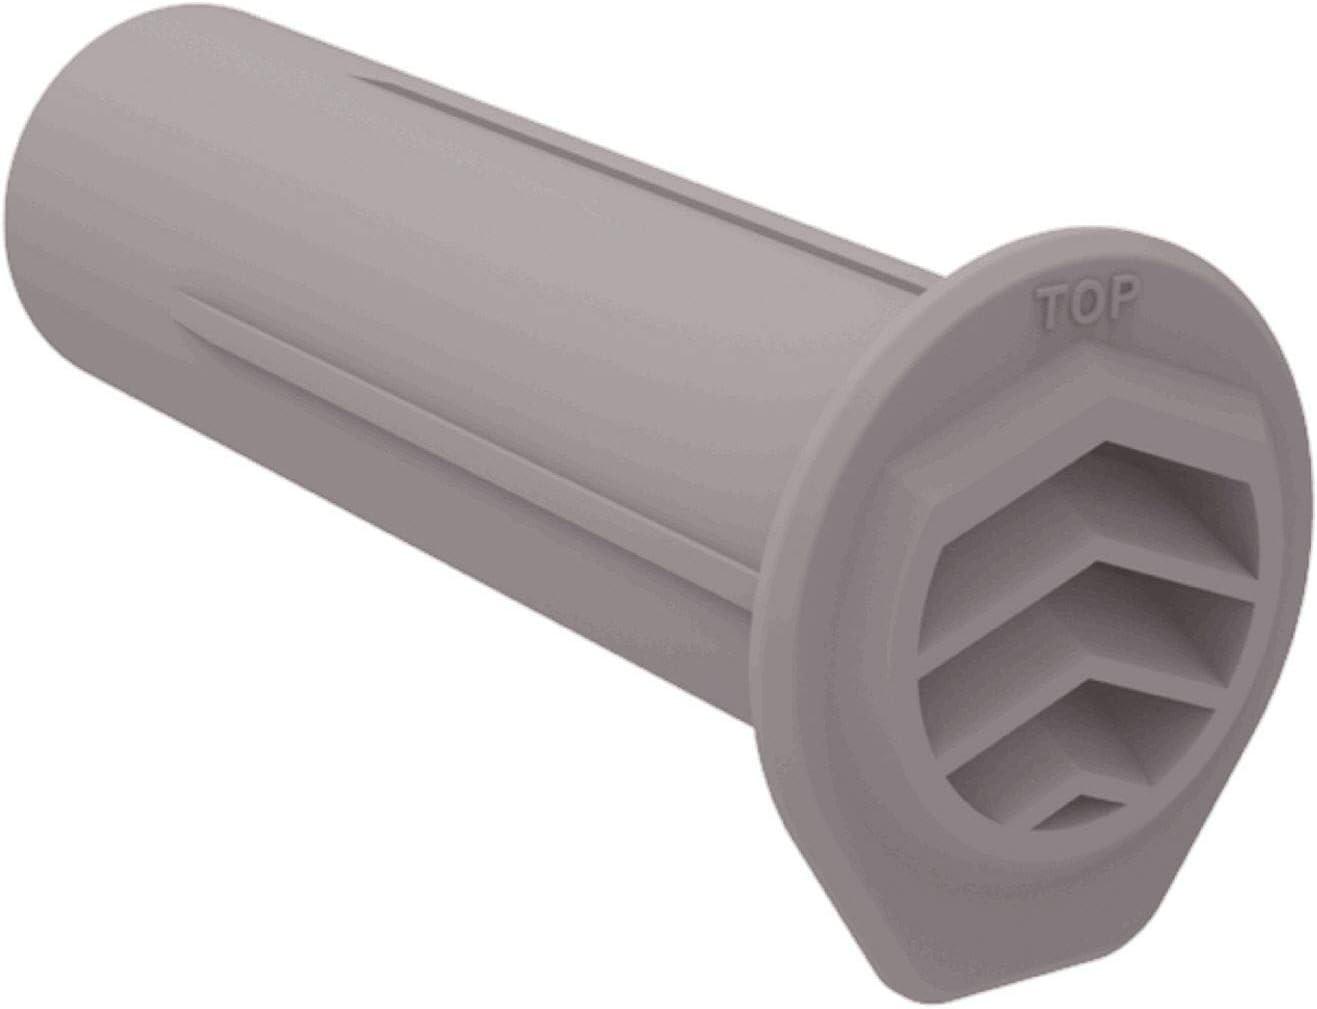 Cavity Wall Round Drill Weep Vents Refurbishment Damp Render /& Brick Walls